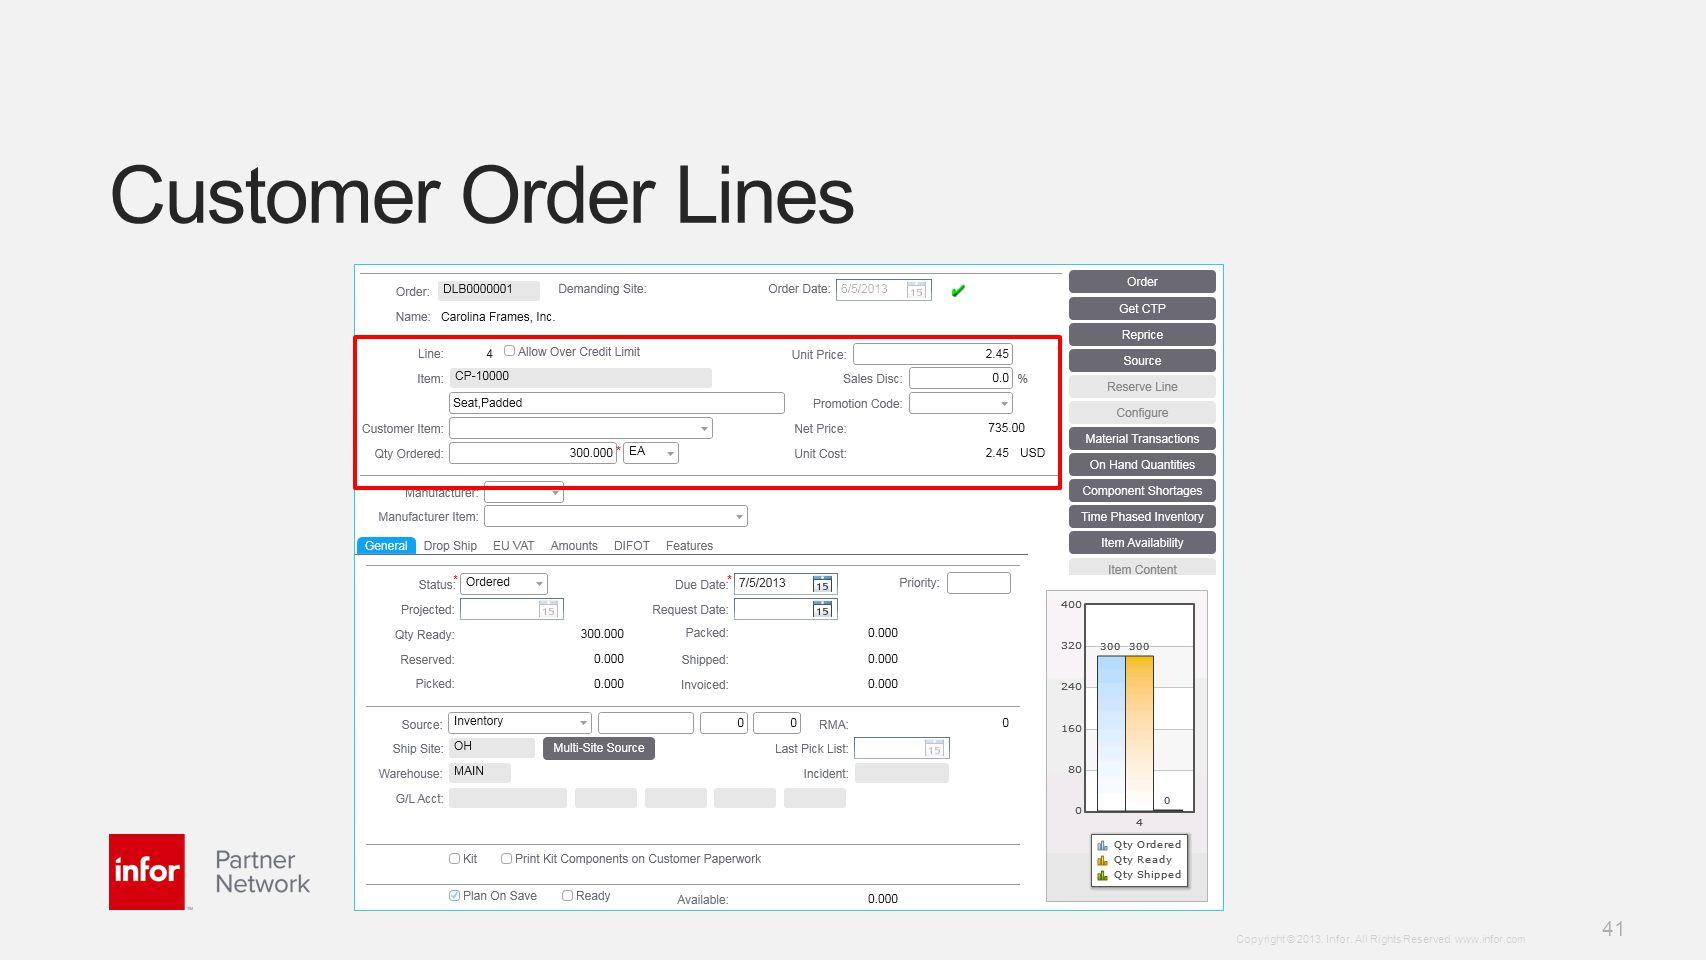 Customer Order Lines